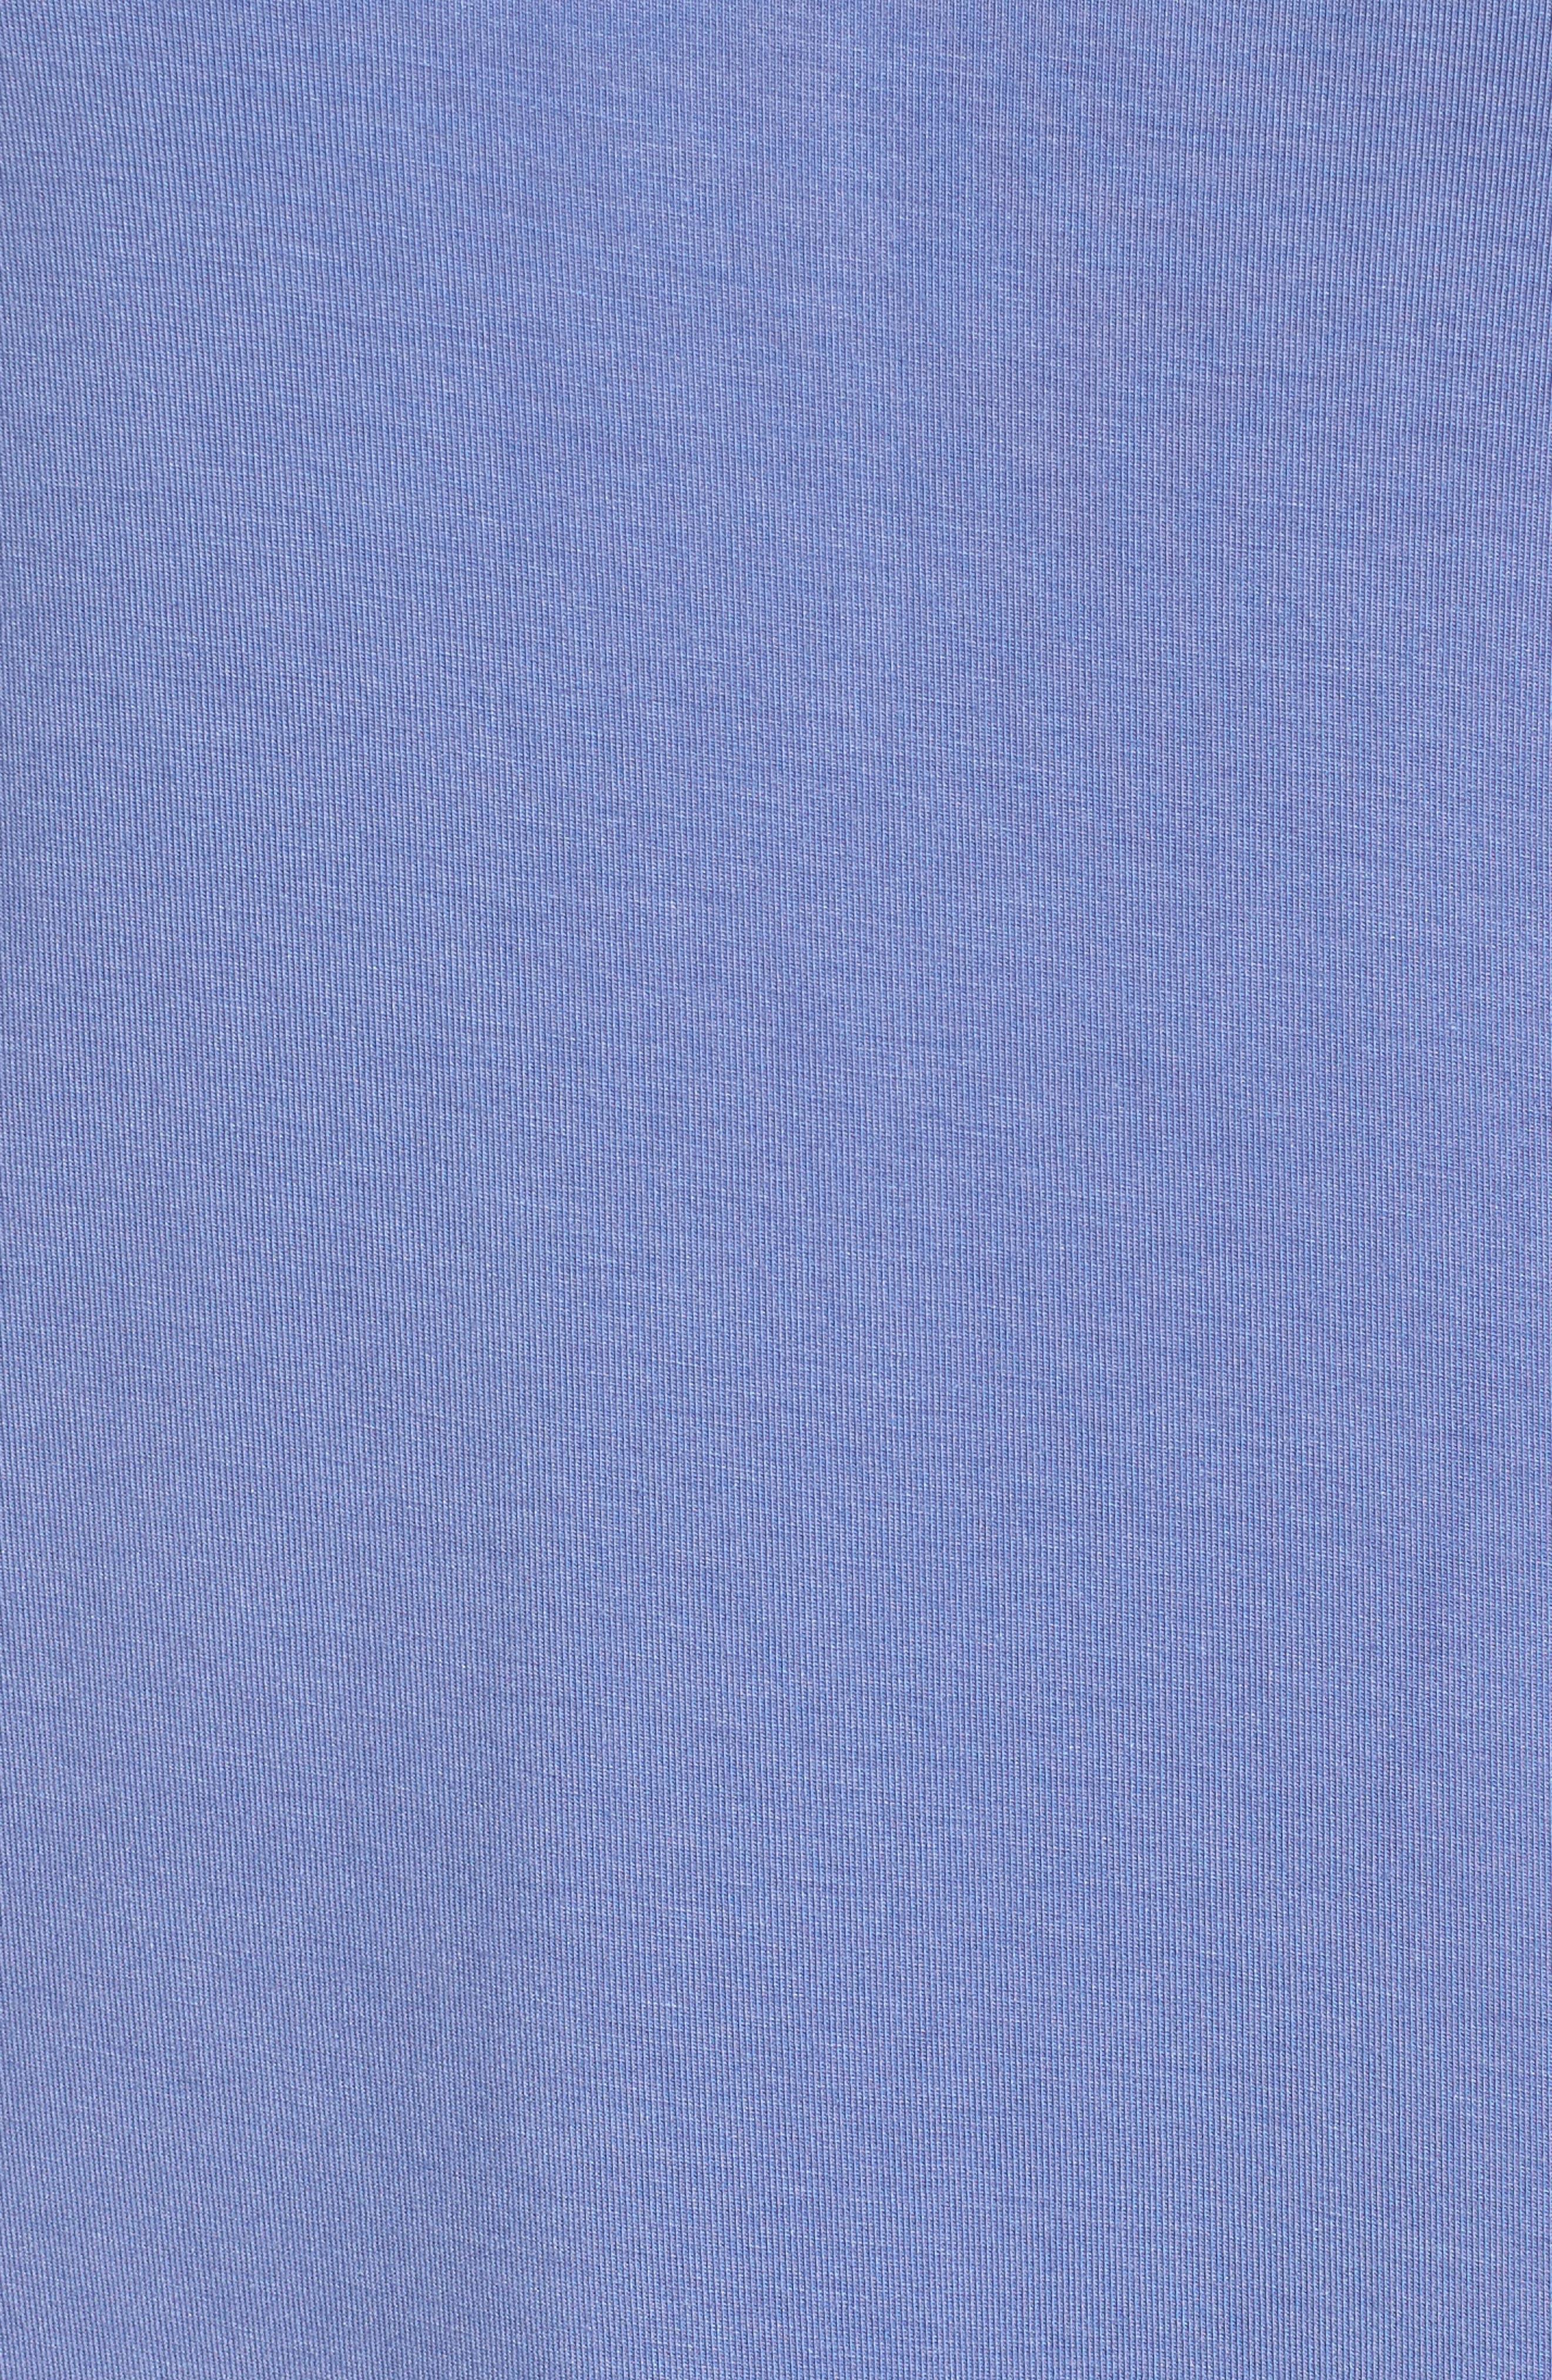 Dolman Sleeve Nightshirt,                             Alternate thumbnail 28, color,